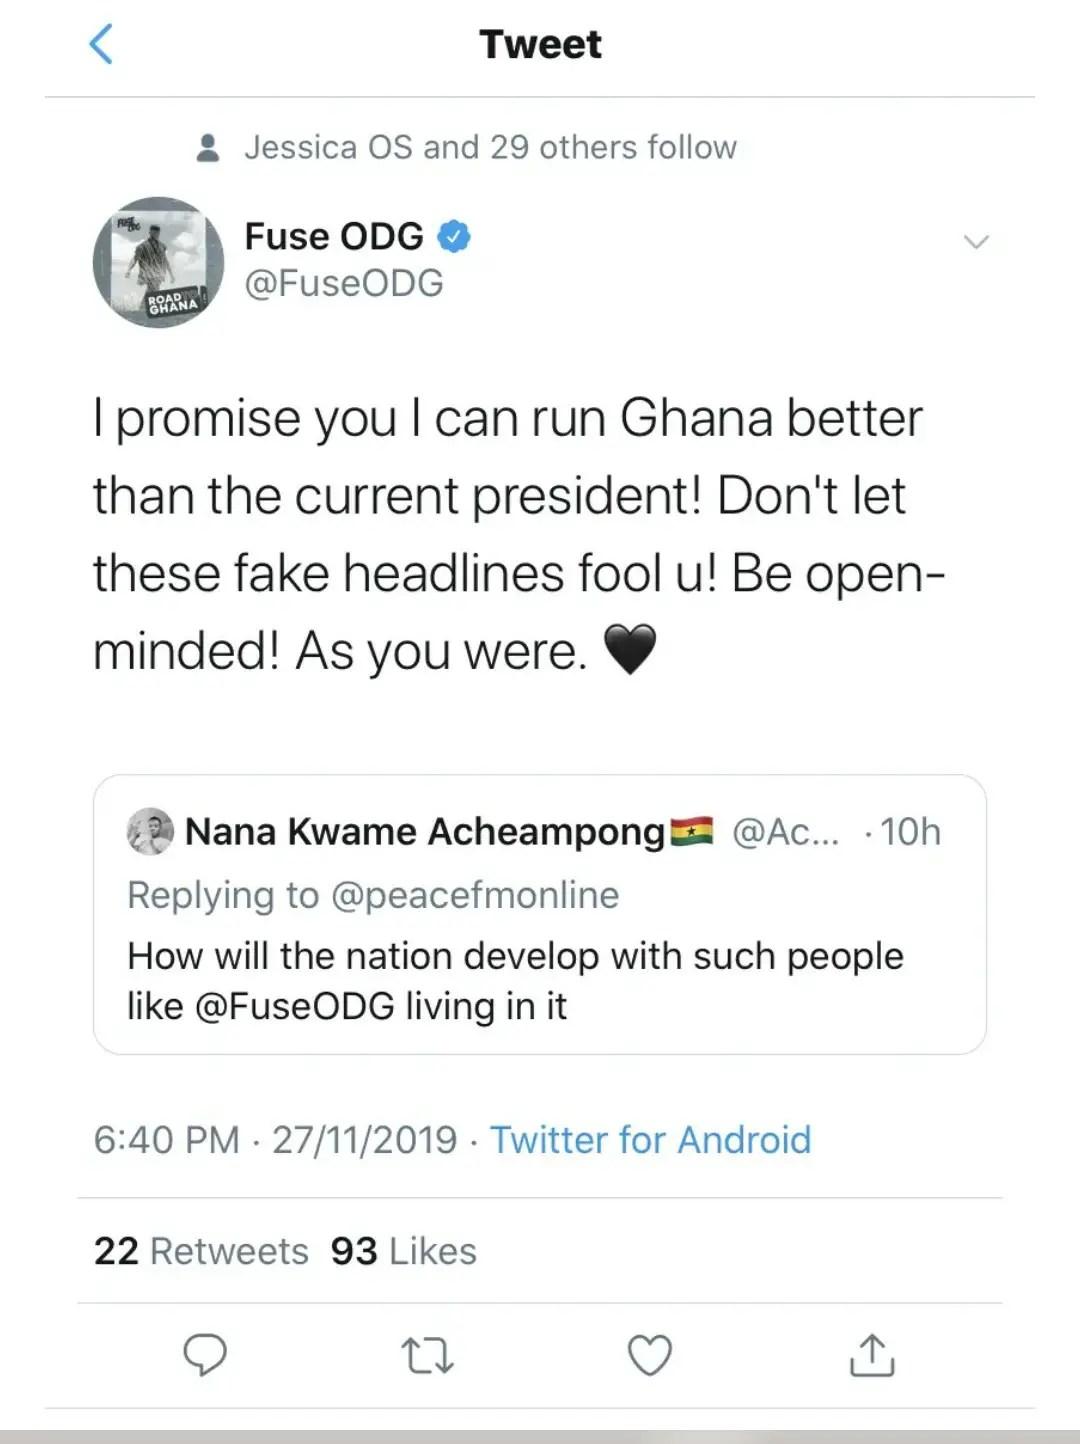 Fuse ODG Claims That He Can Rule Ghana Better Than President Nana Addo - EOnlineGH.Com